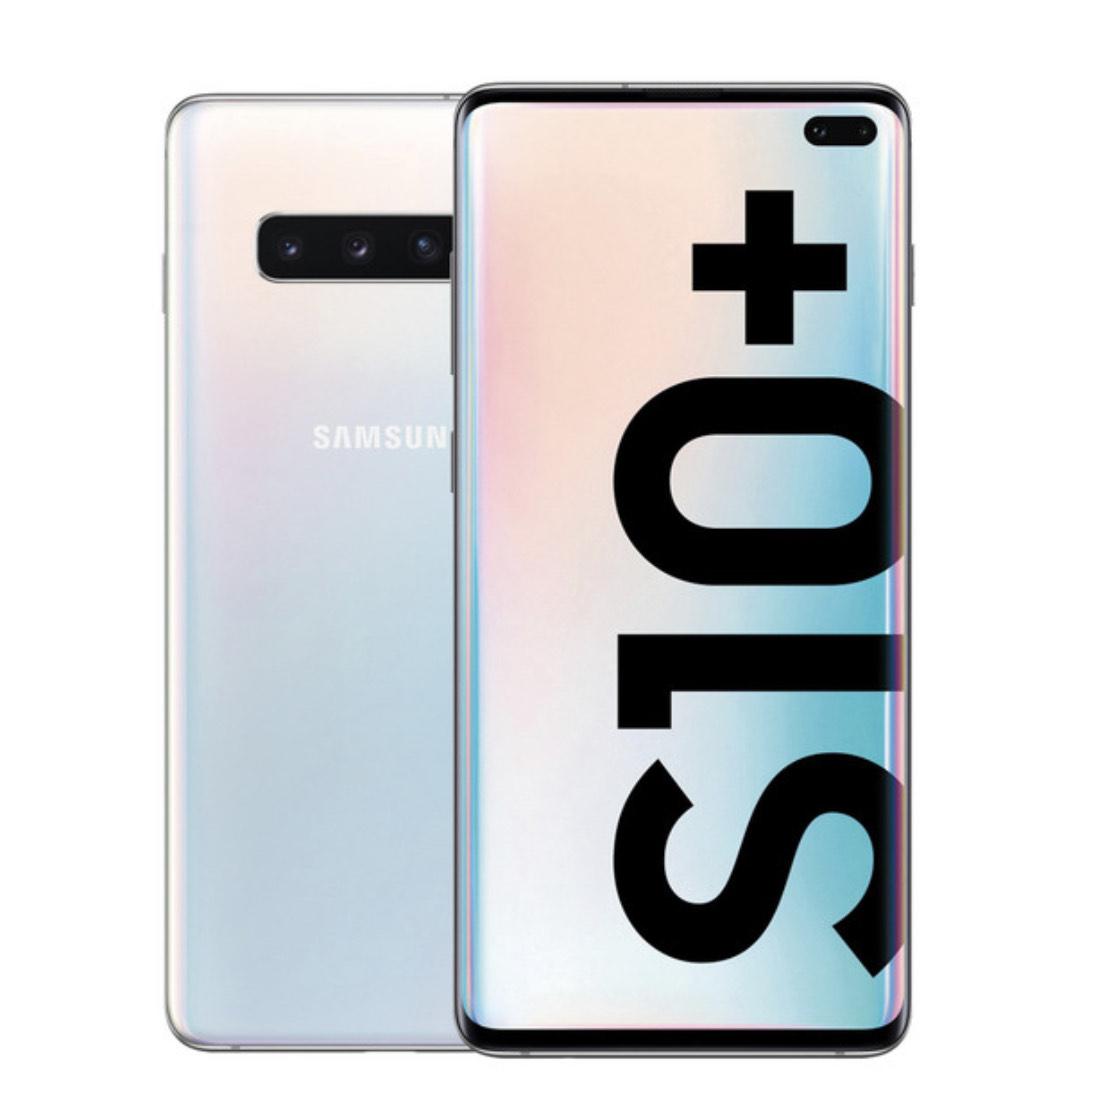 Samsung Galaxy S10+ 128/8GB White